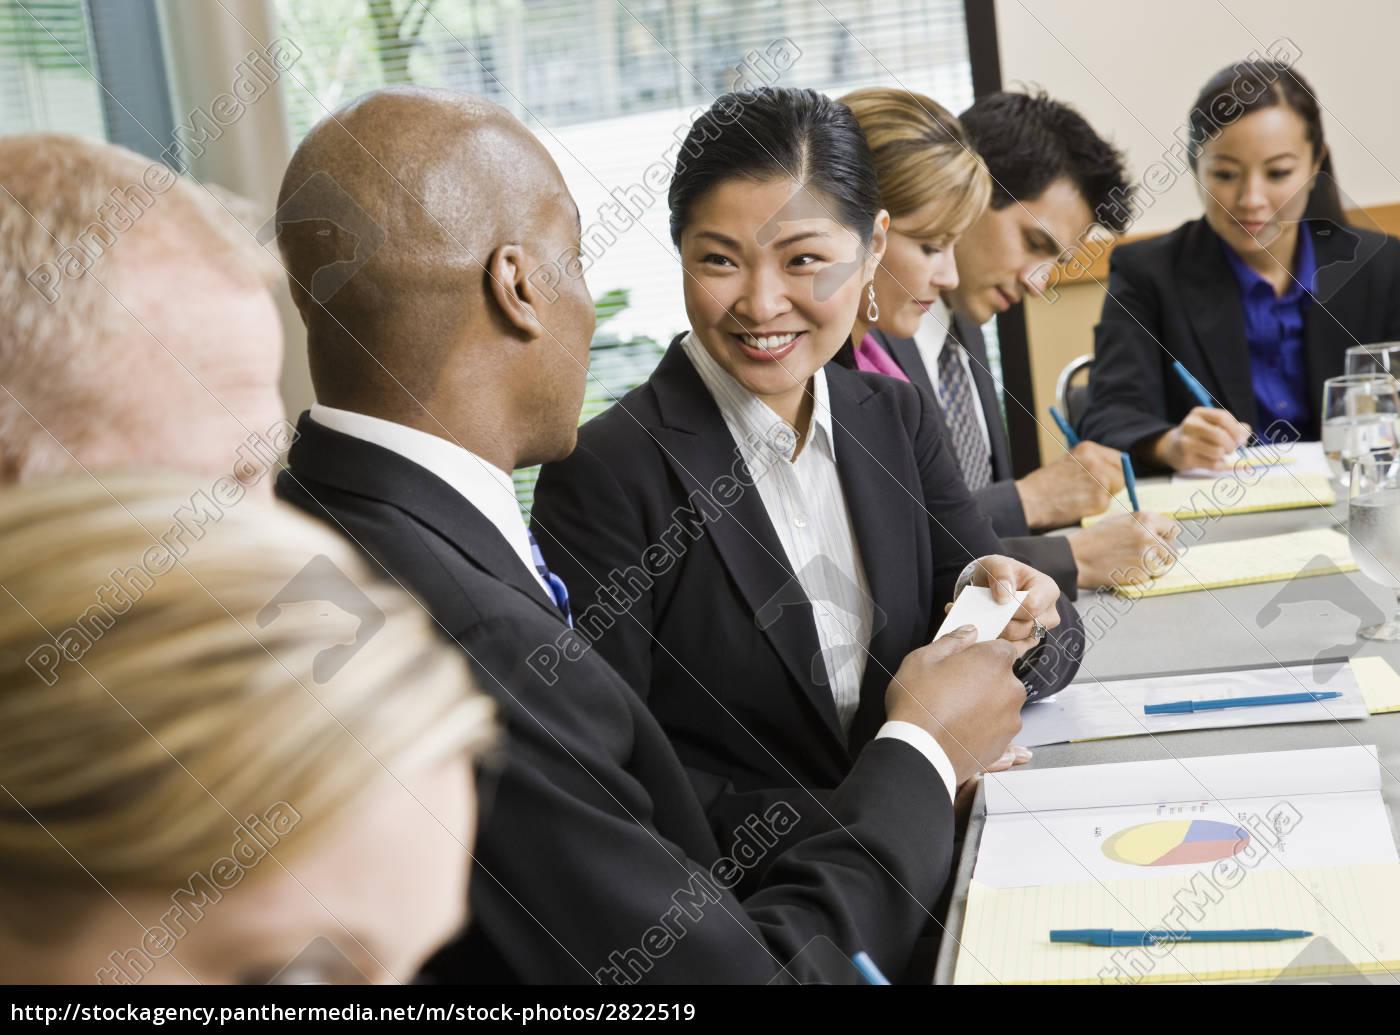 businesswoman, at, meeting, smiling - 2822519